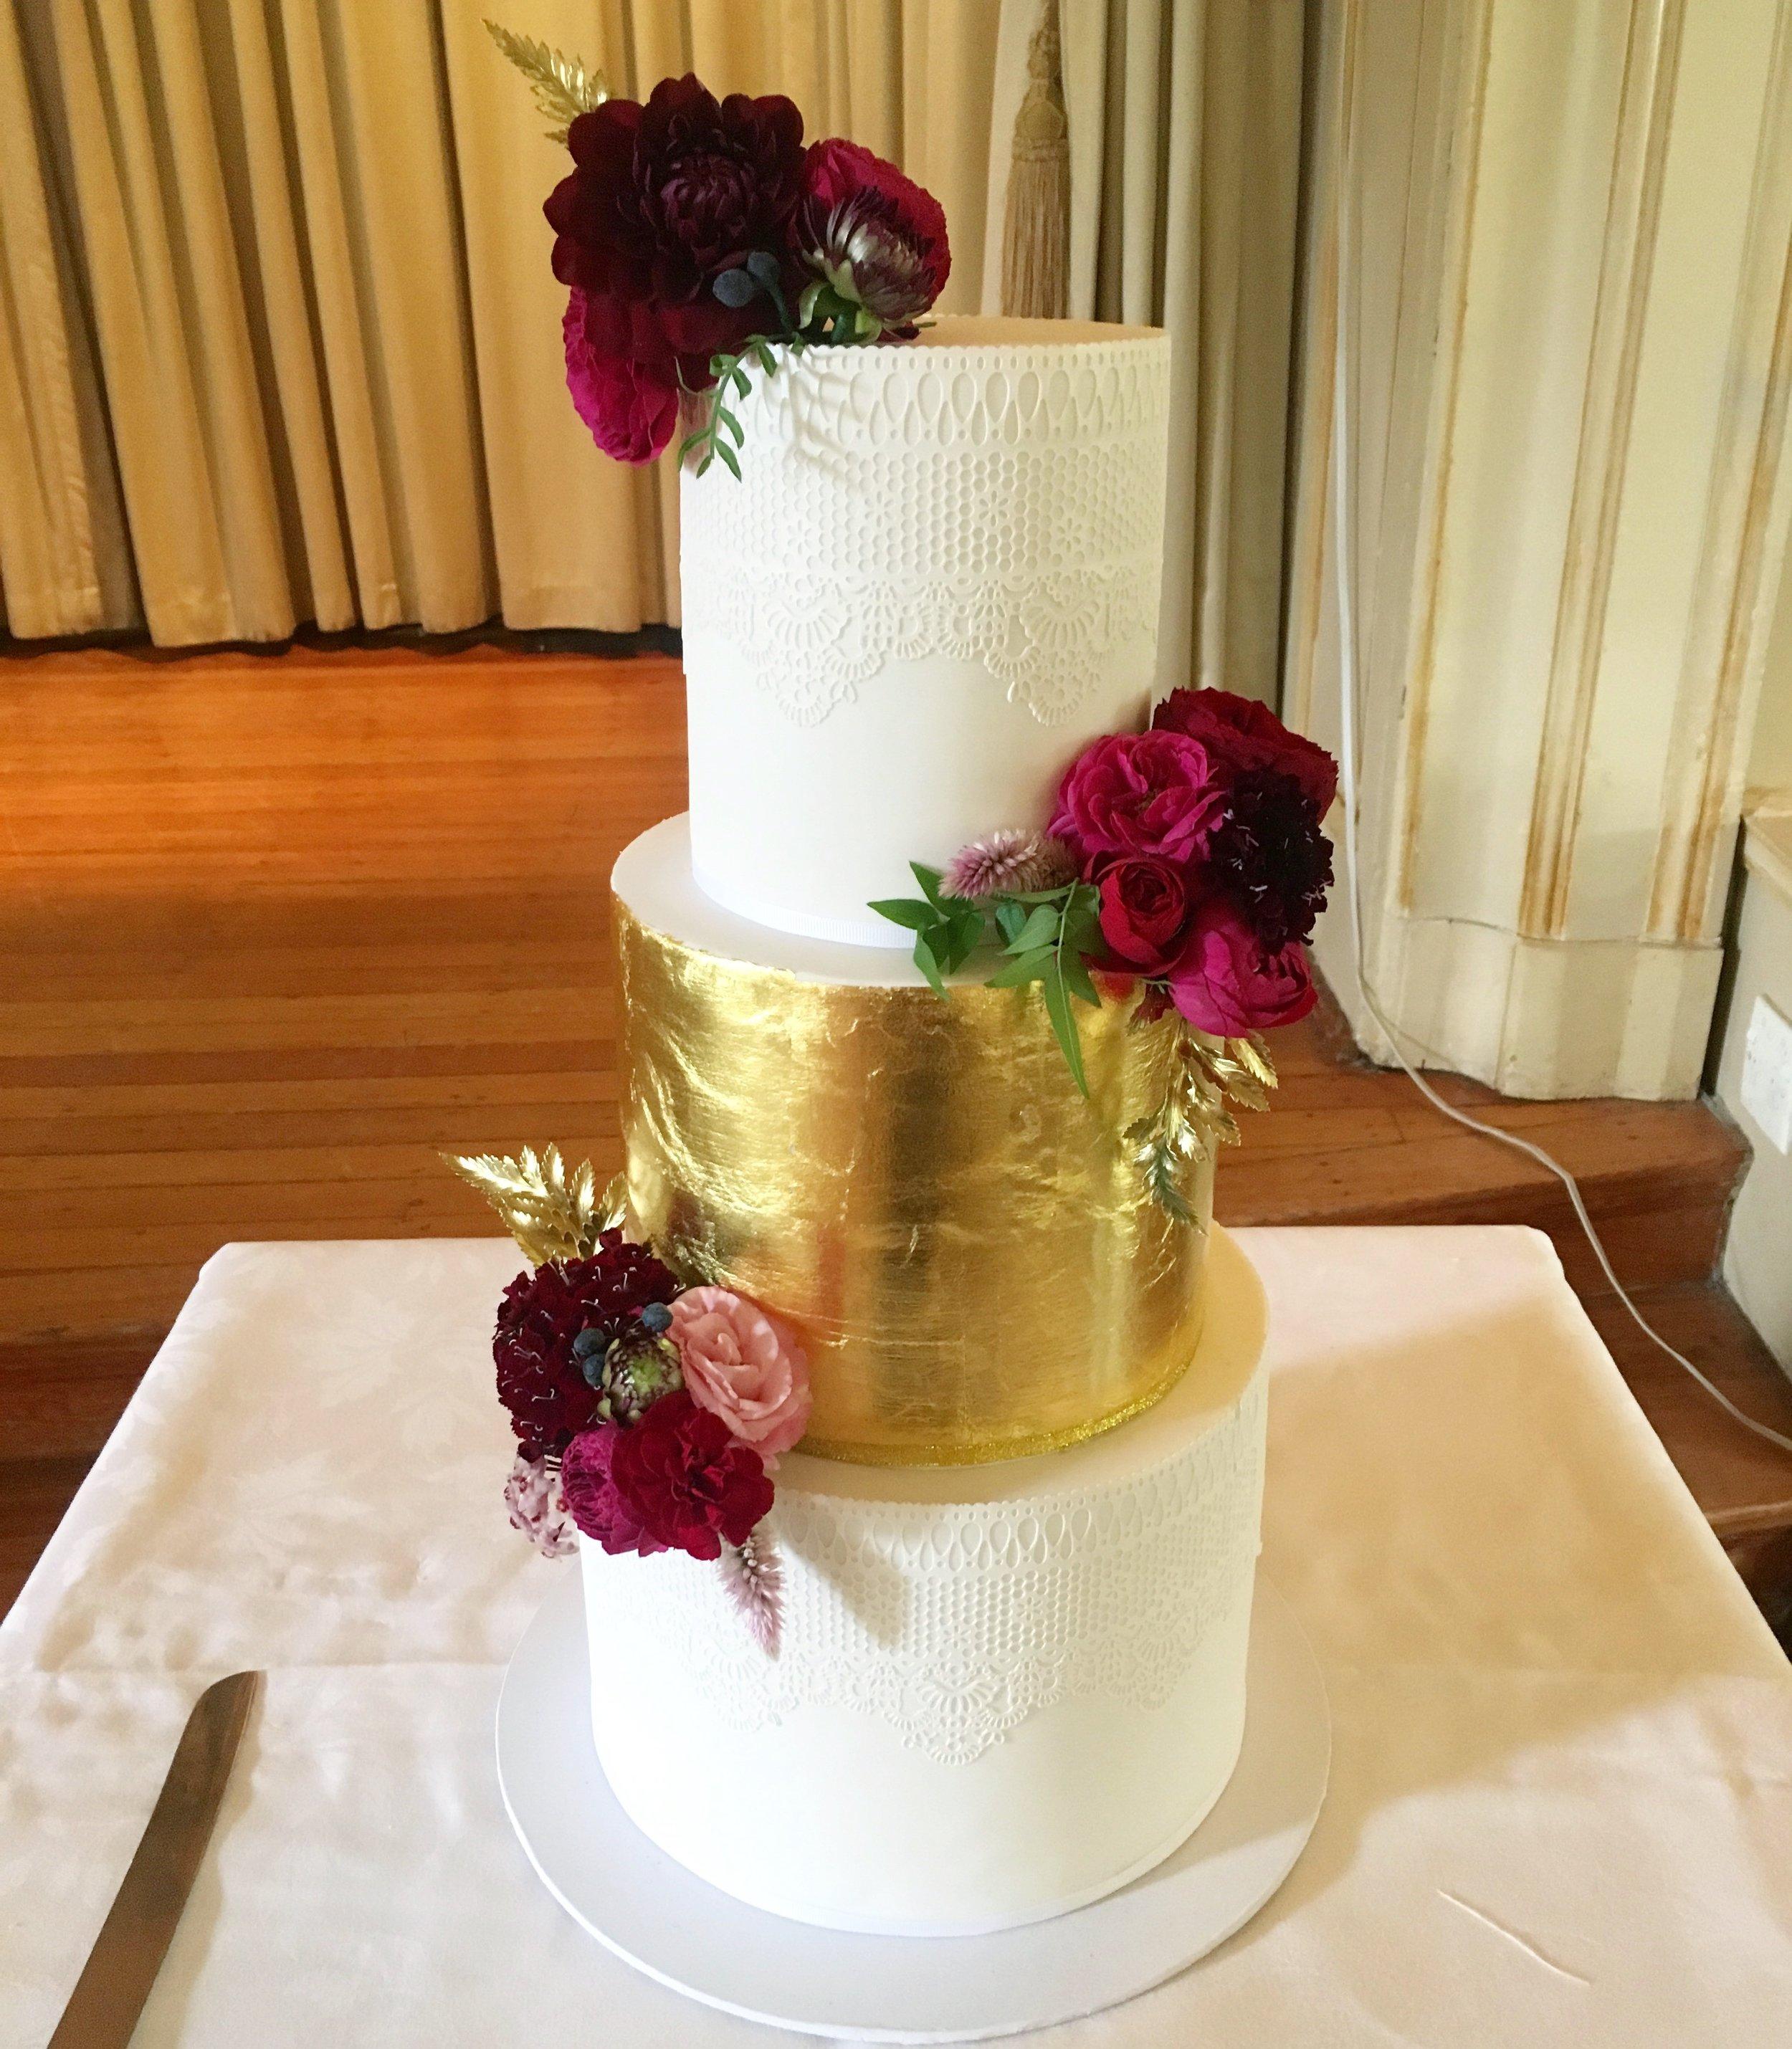 Copy of Gold Leaf Wedding Cake with Fresh Flowers